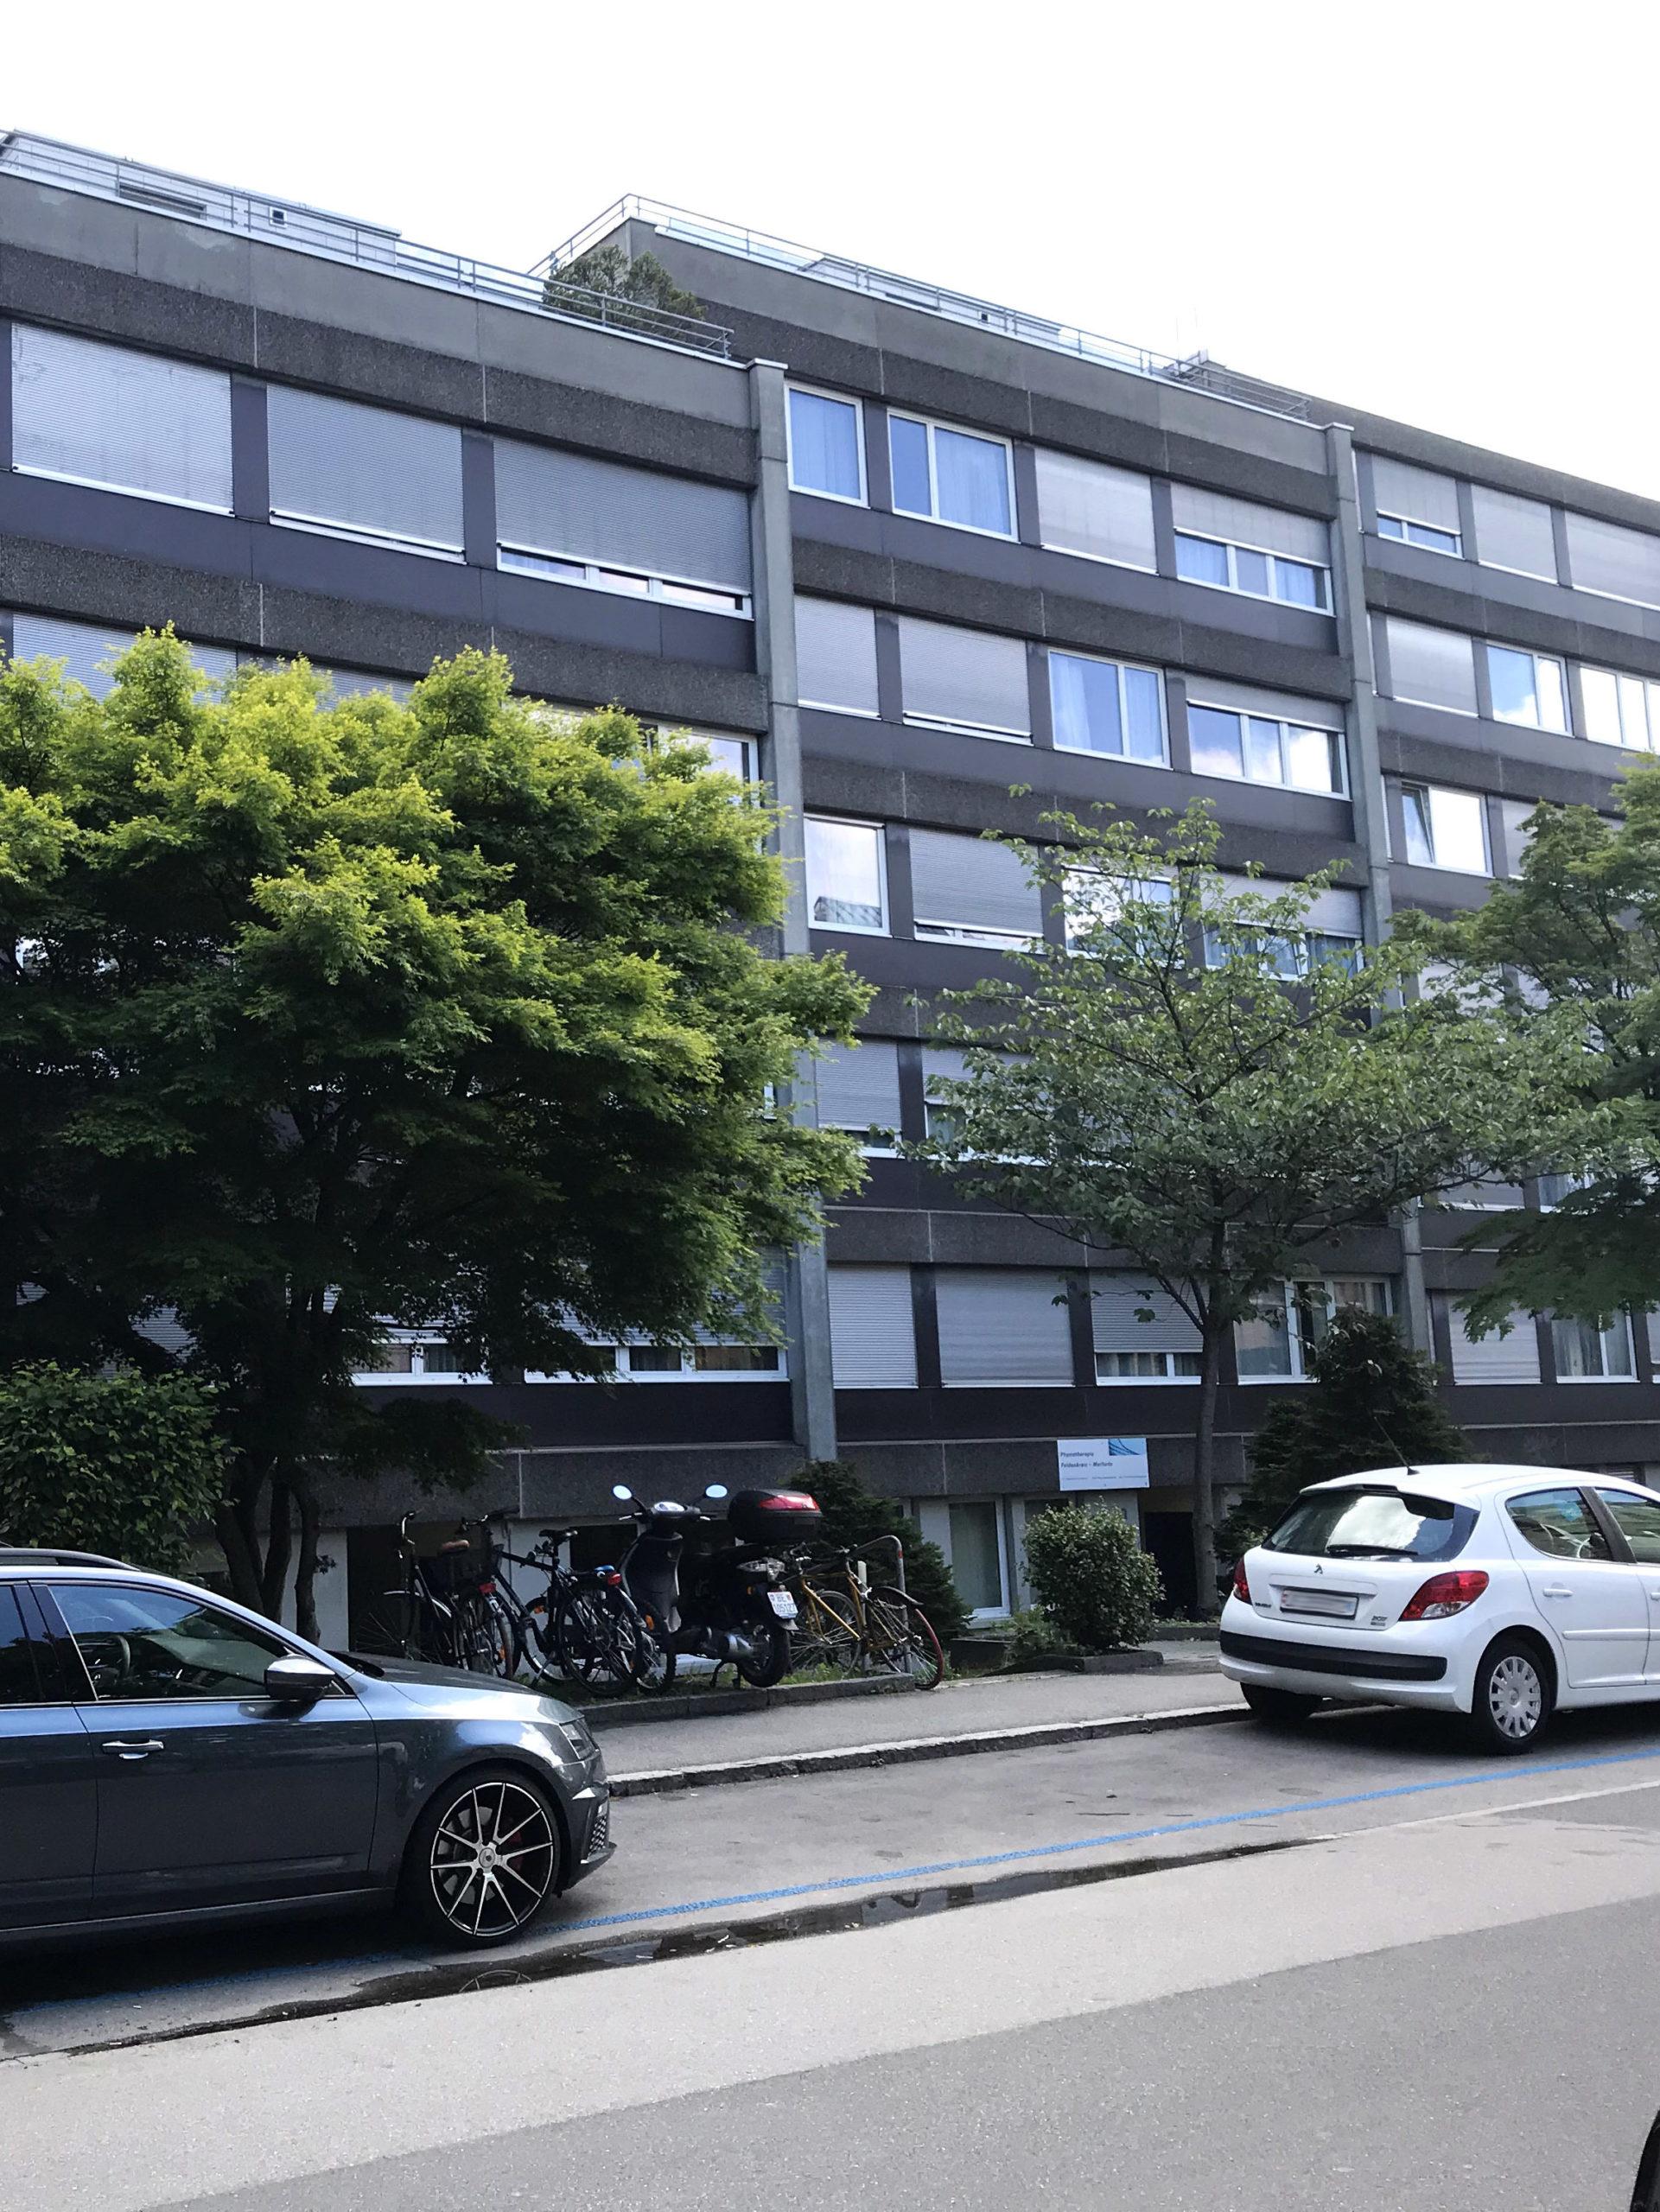 Fabrikstrasse-Bern_scaled-scaled-aspect-ratio-475-633